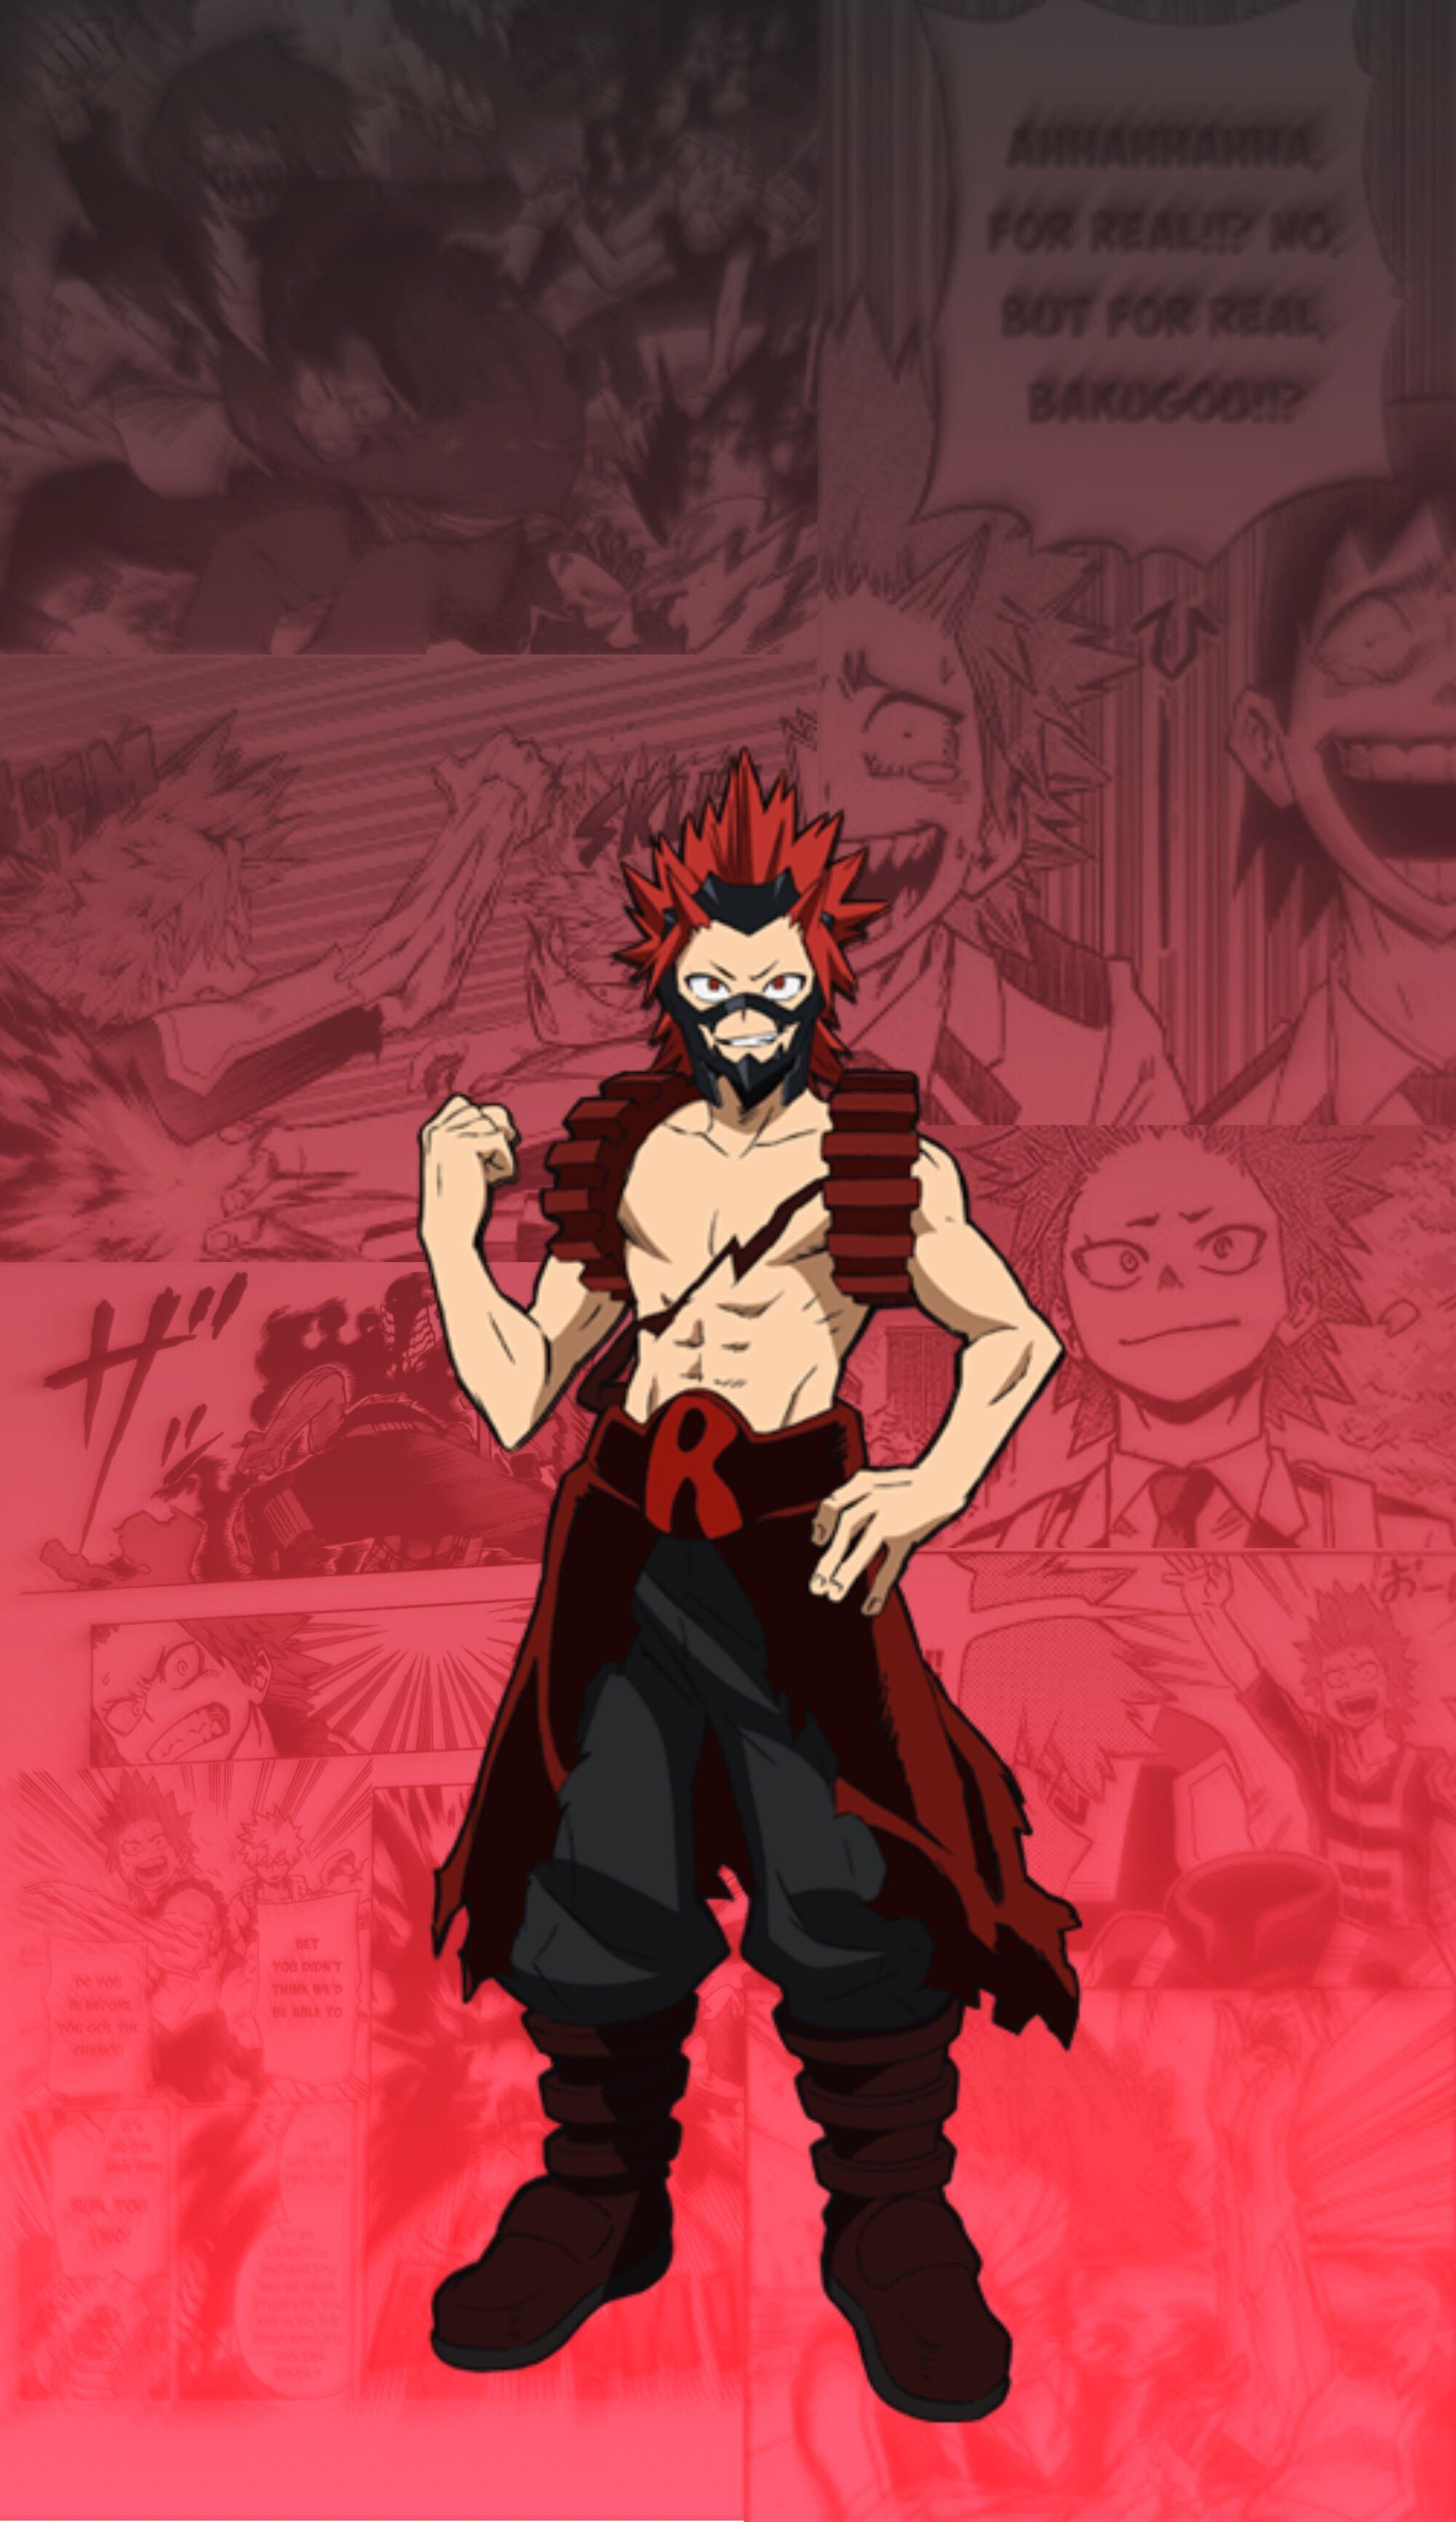 My Hero Academia Kirishima Wallpapers Top Free My Hero Academia Kirishima Backgrounds Wallpaperaccess